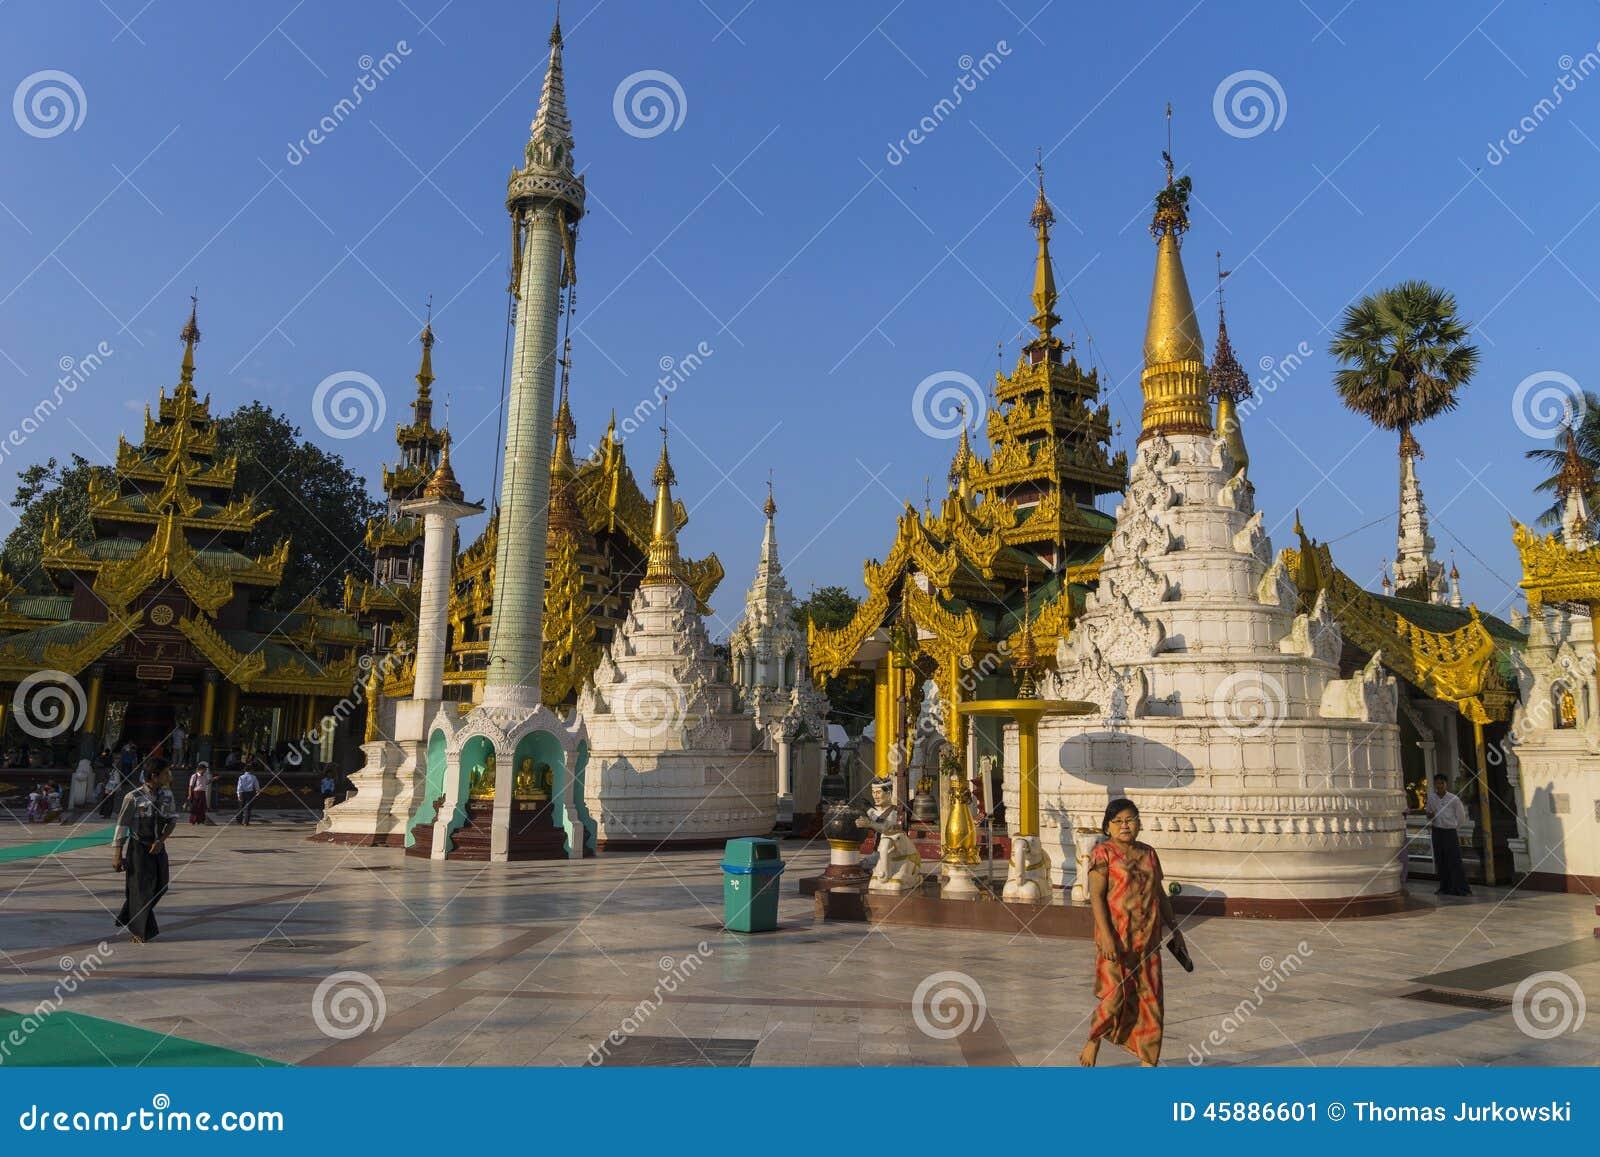 Shwedagon pagoda in yangon editorial photo image 45886601 for Http wikipedia org wiki